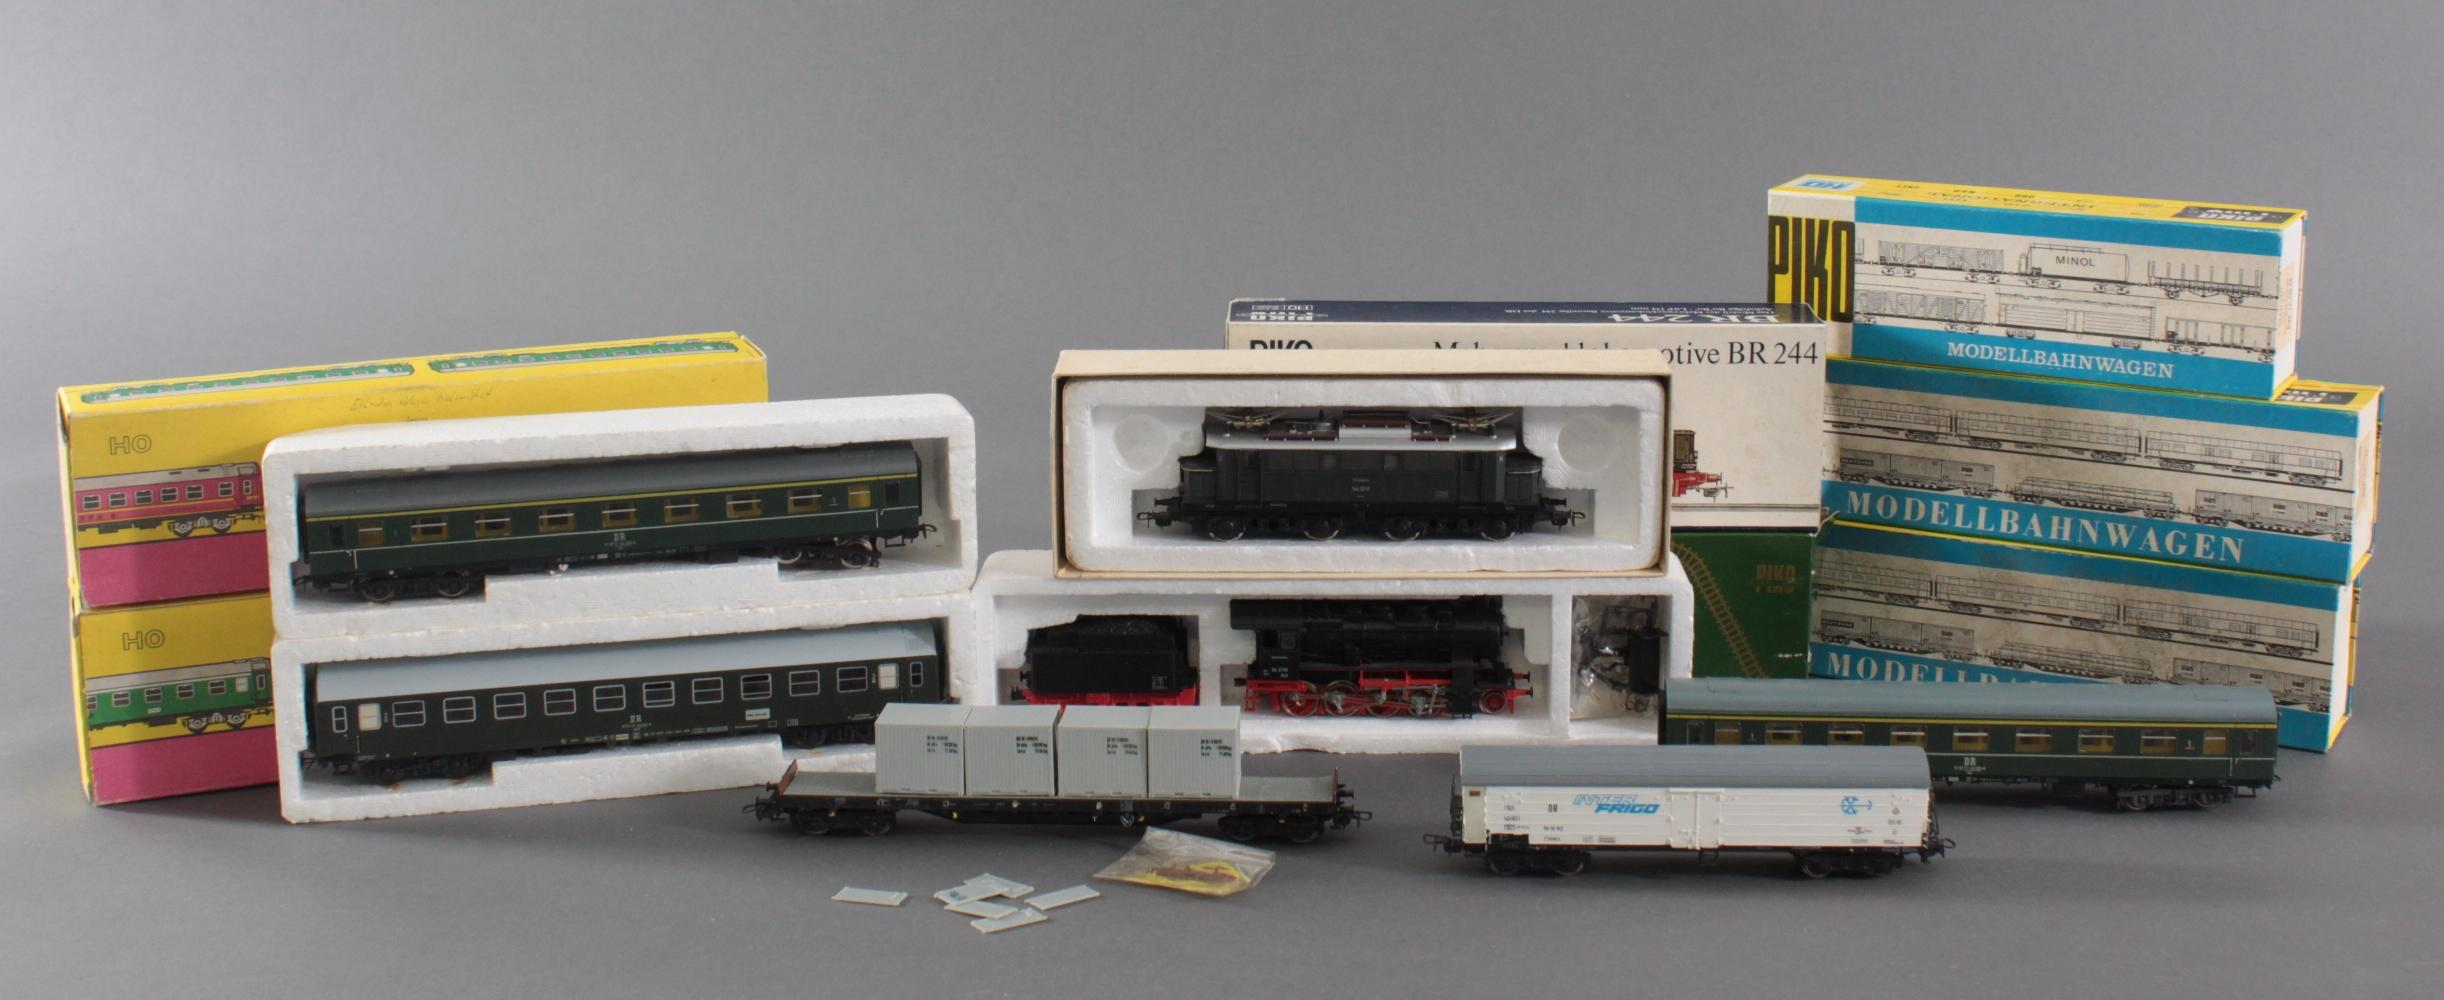 2 Piko Lokomotiven mit 2 VEB und 3 Piko Waggons Spur H0